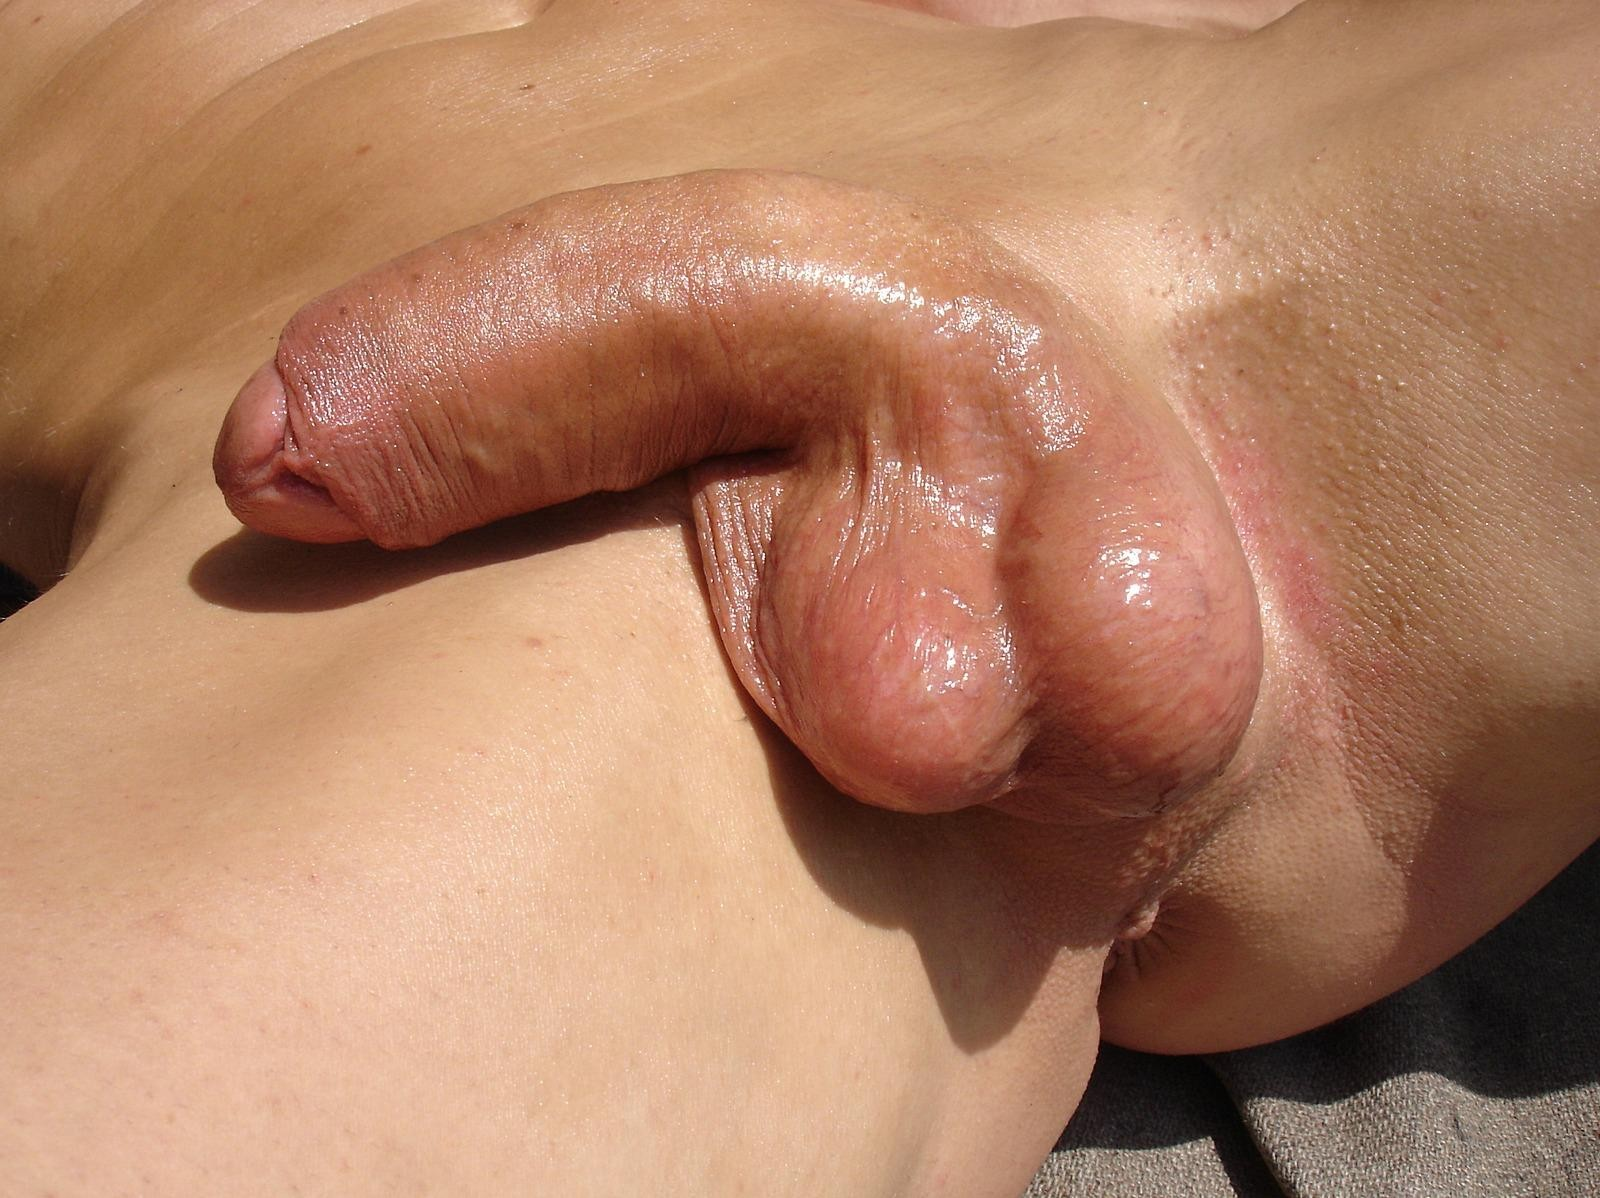 showing porn images for karina kay squirt porn #closeup #cockpic #softcock #penis #amateur #uncut #balls #shavedcock #shavedballs #cock